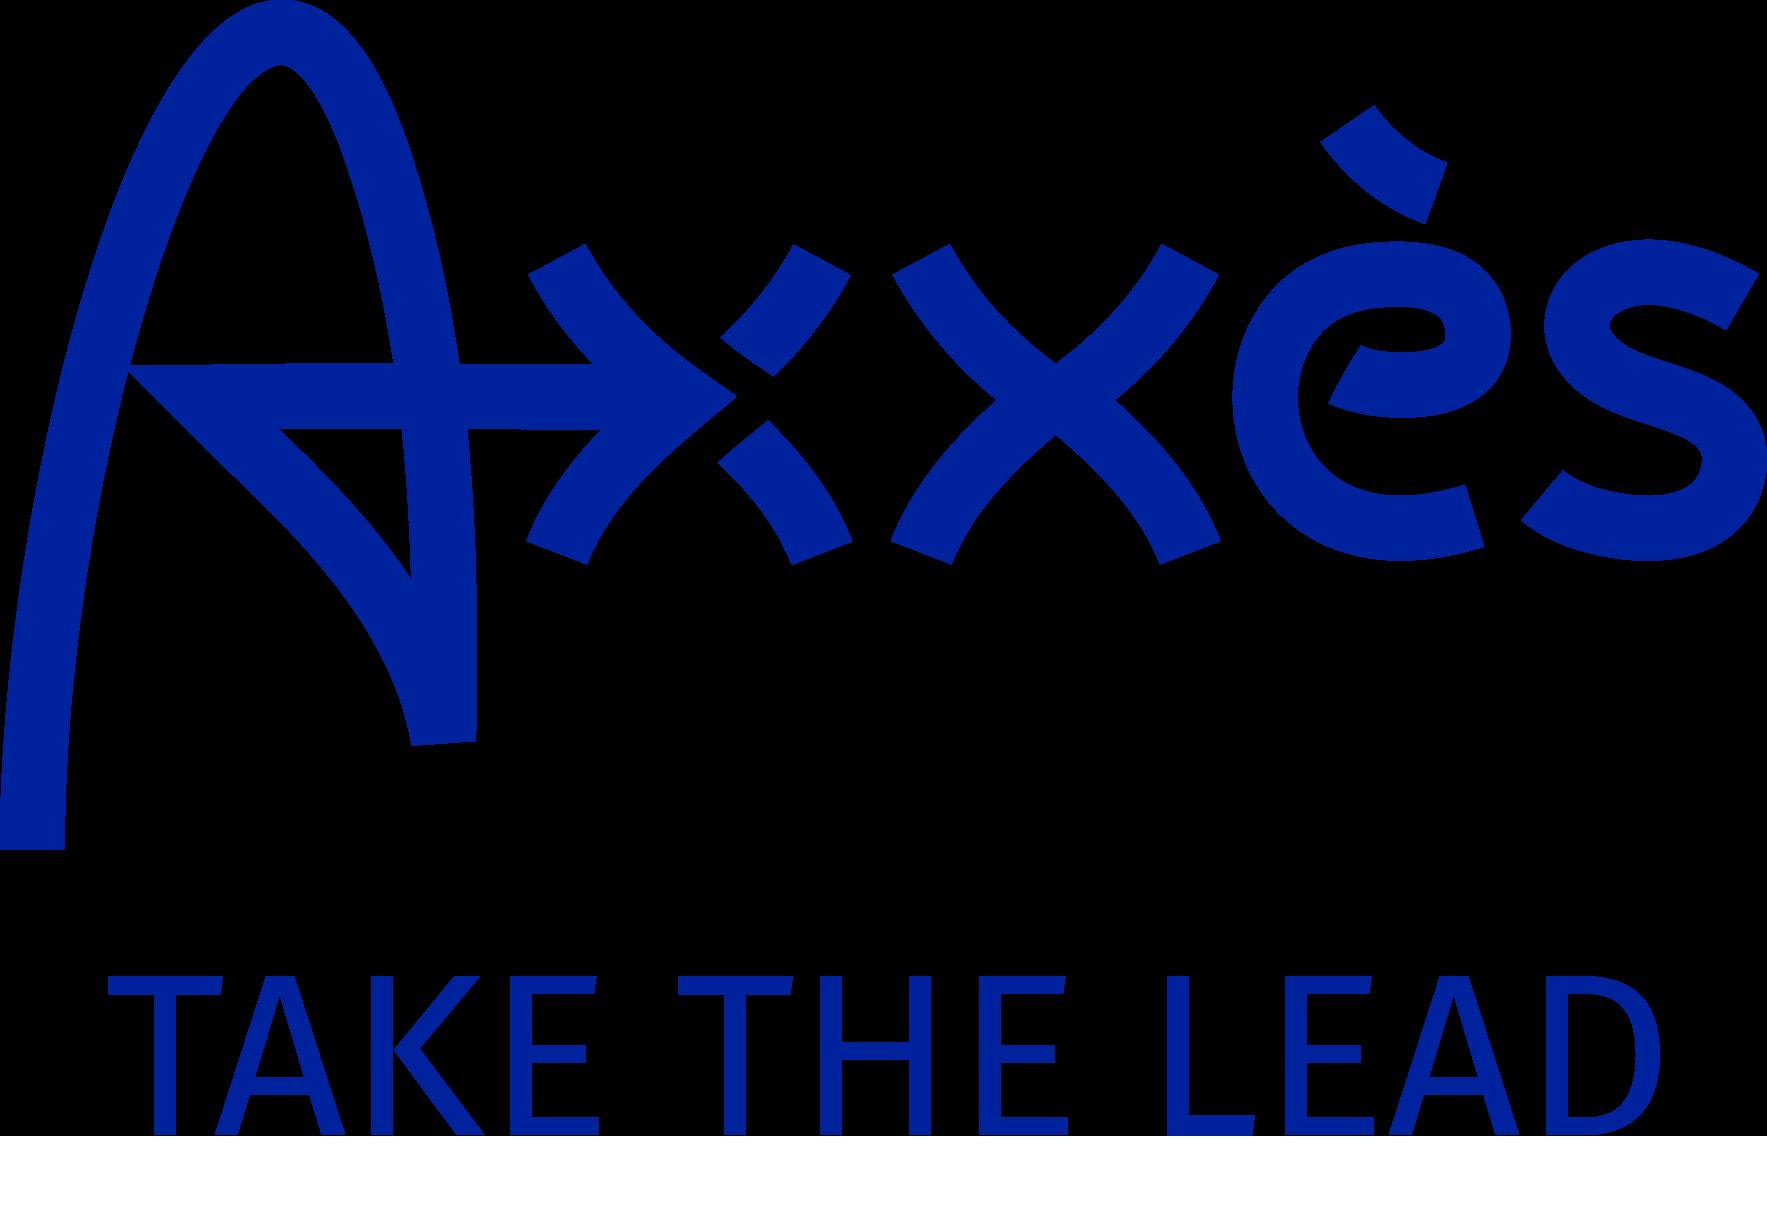 Logo + take the lead